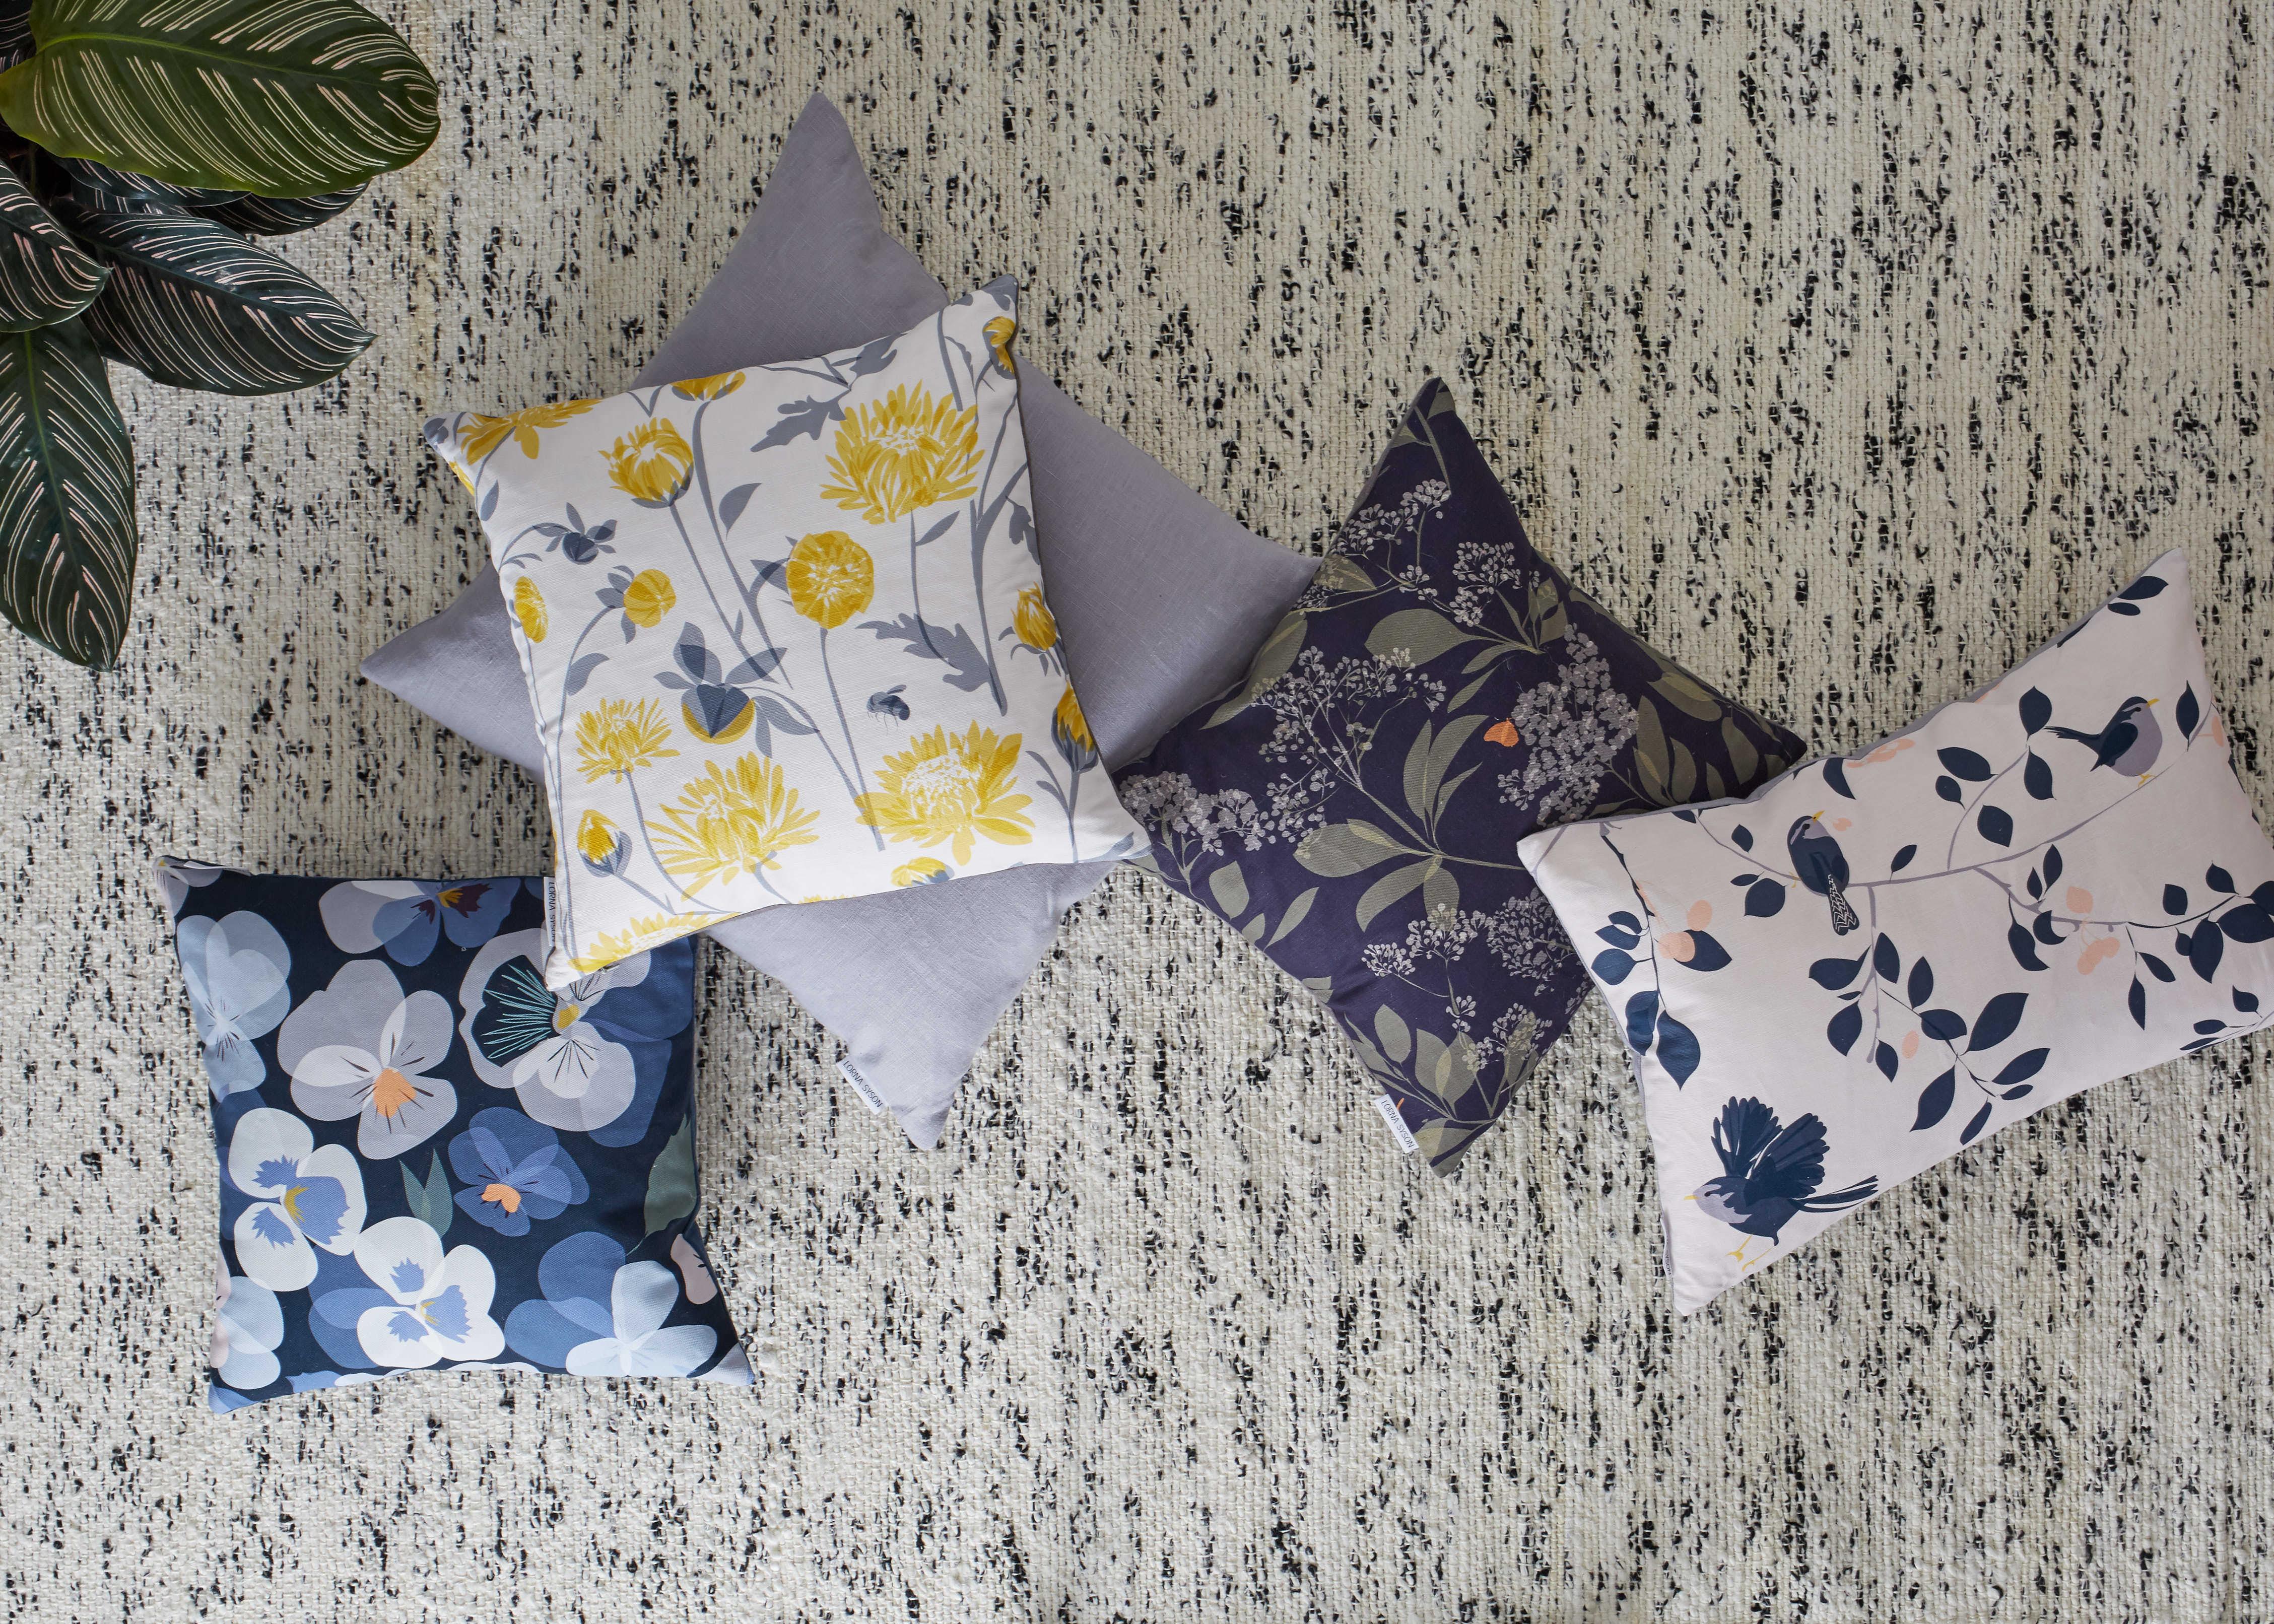 Lorna Syson cushions